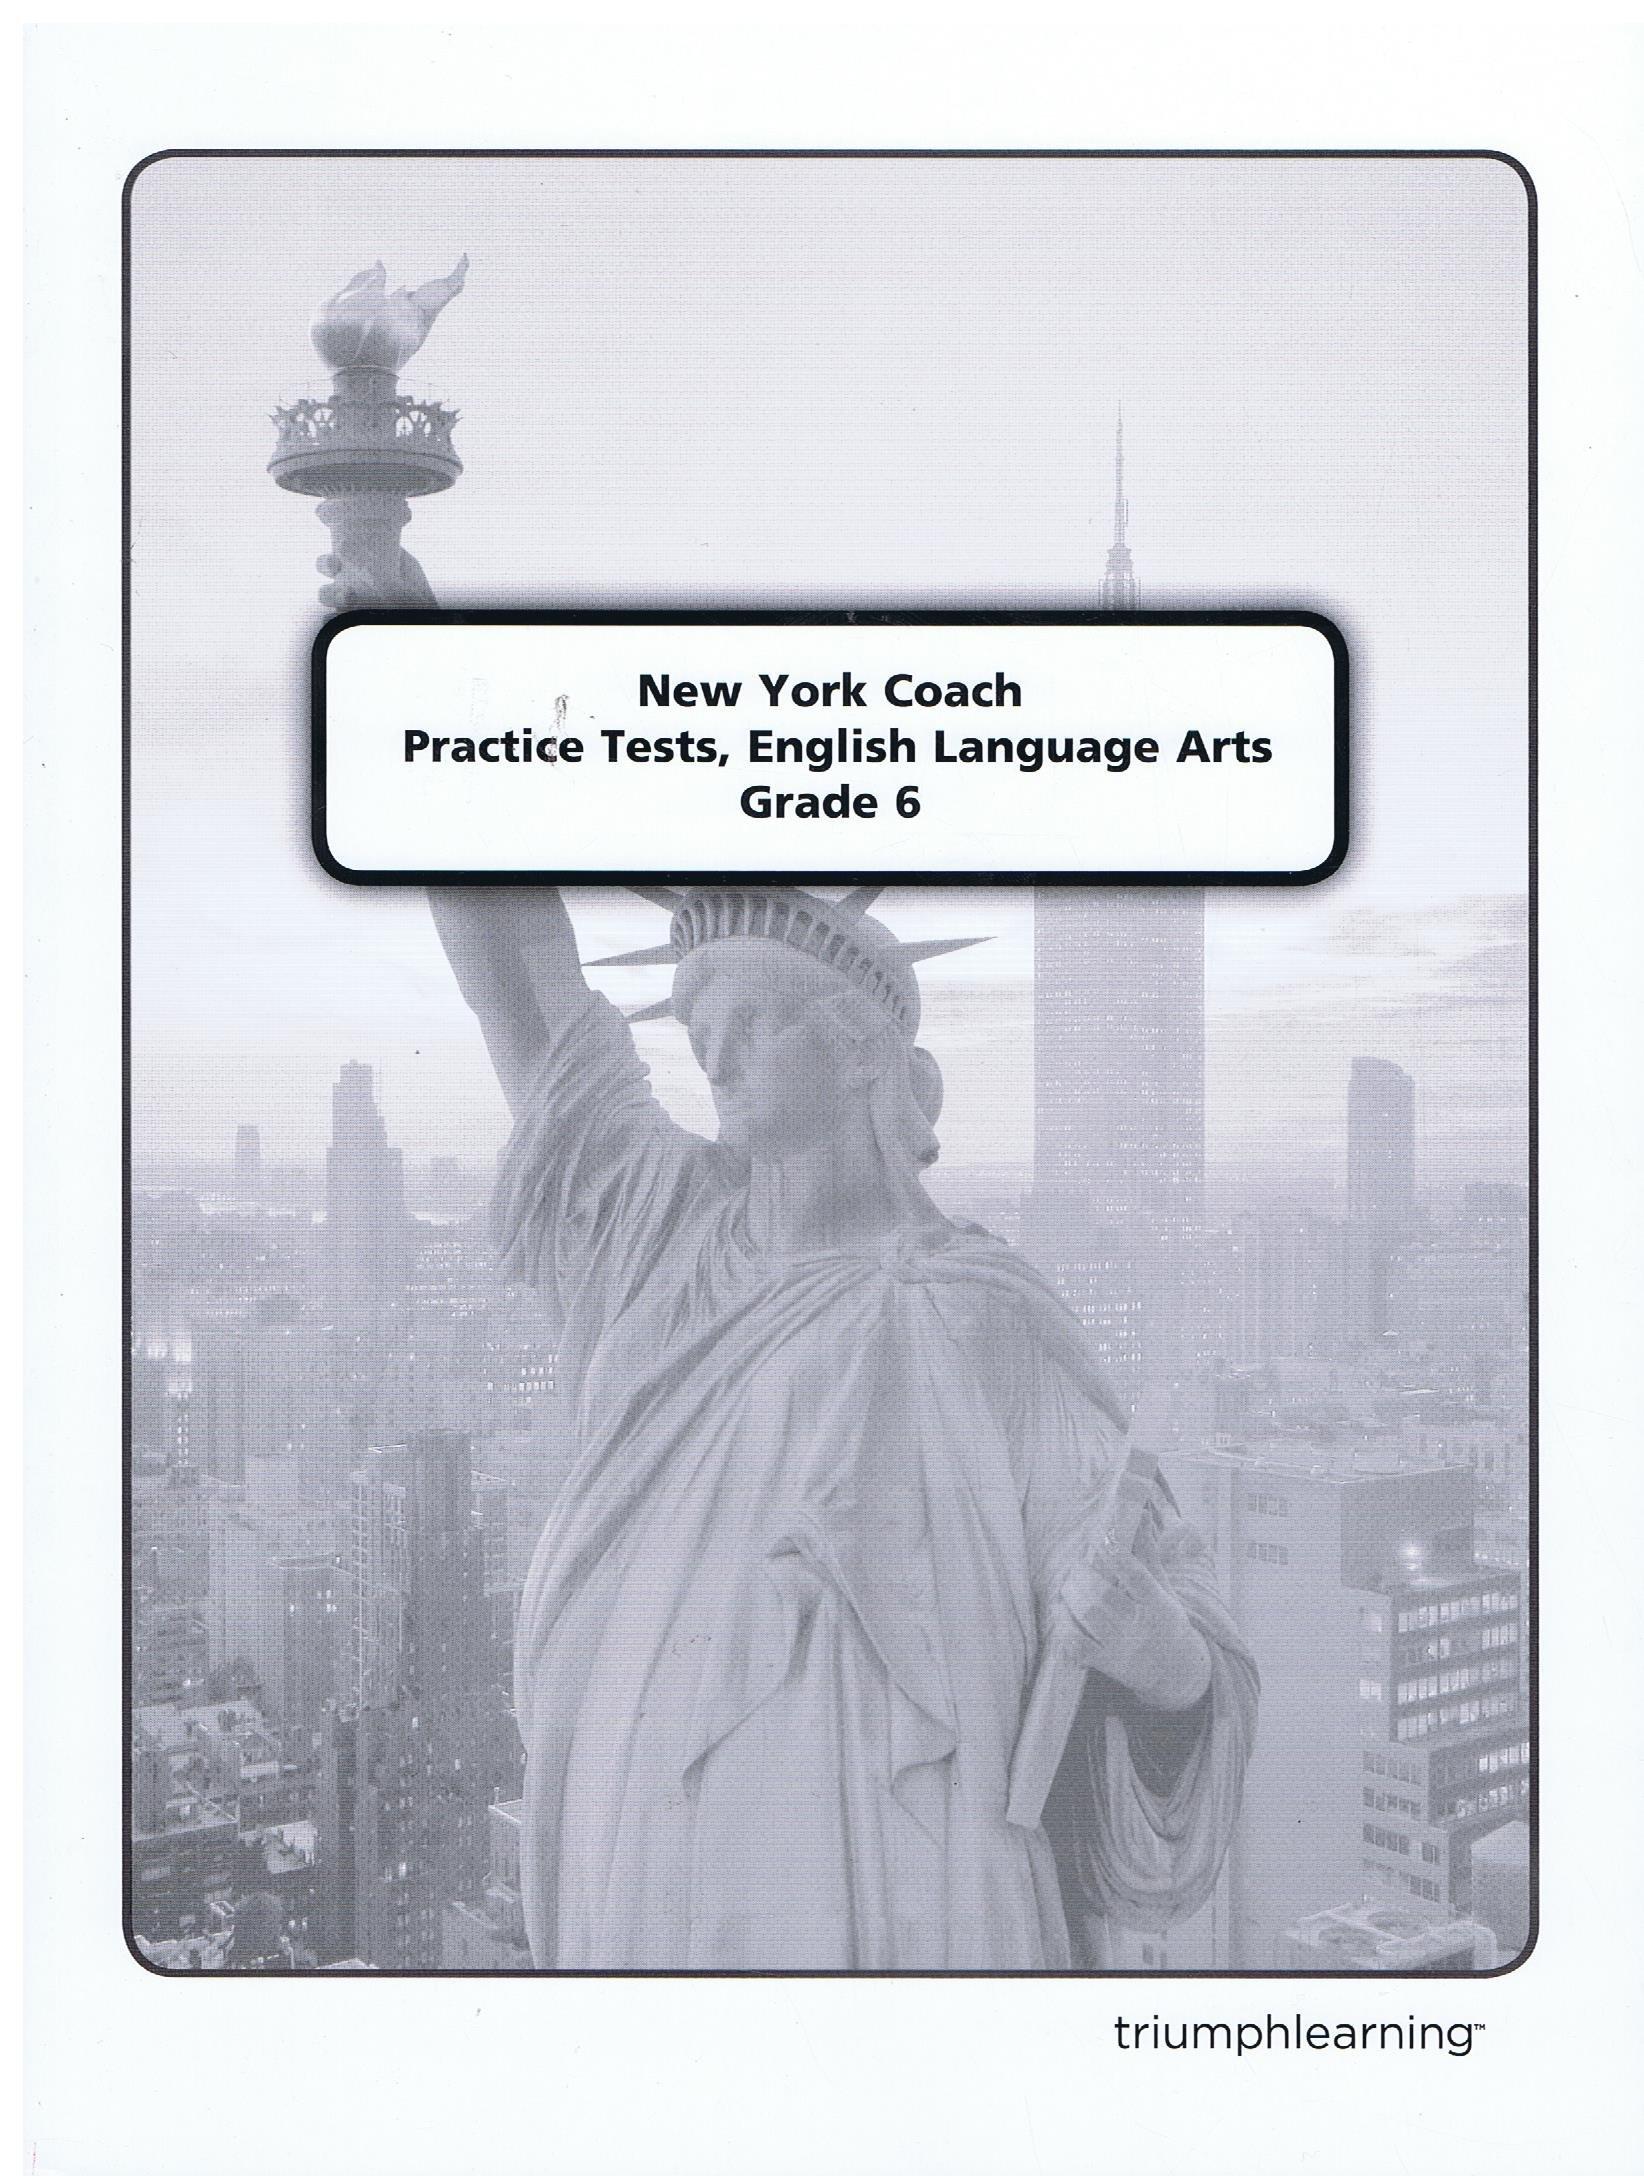 New York Coach Practice Tests, English Language Arts, Grade 6 with